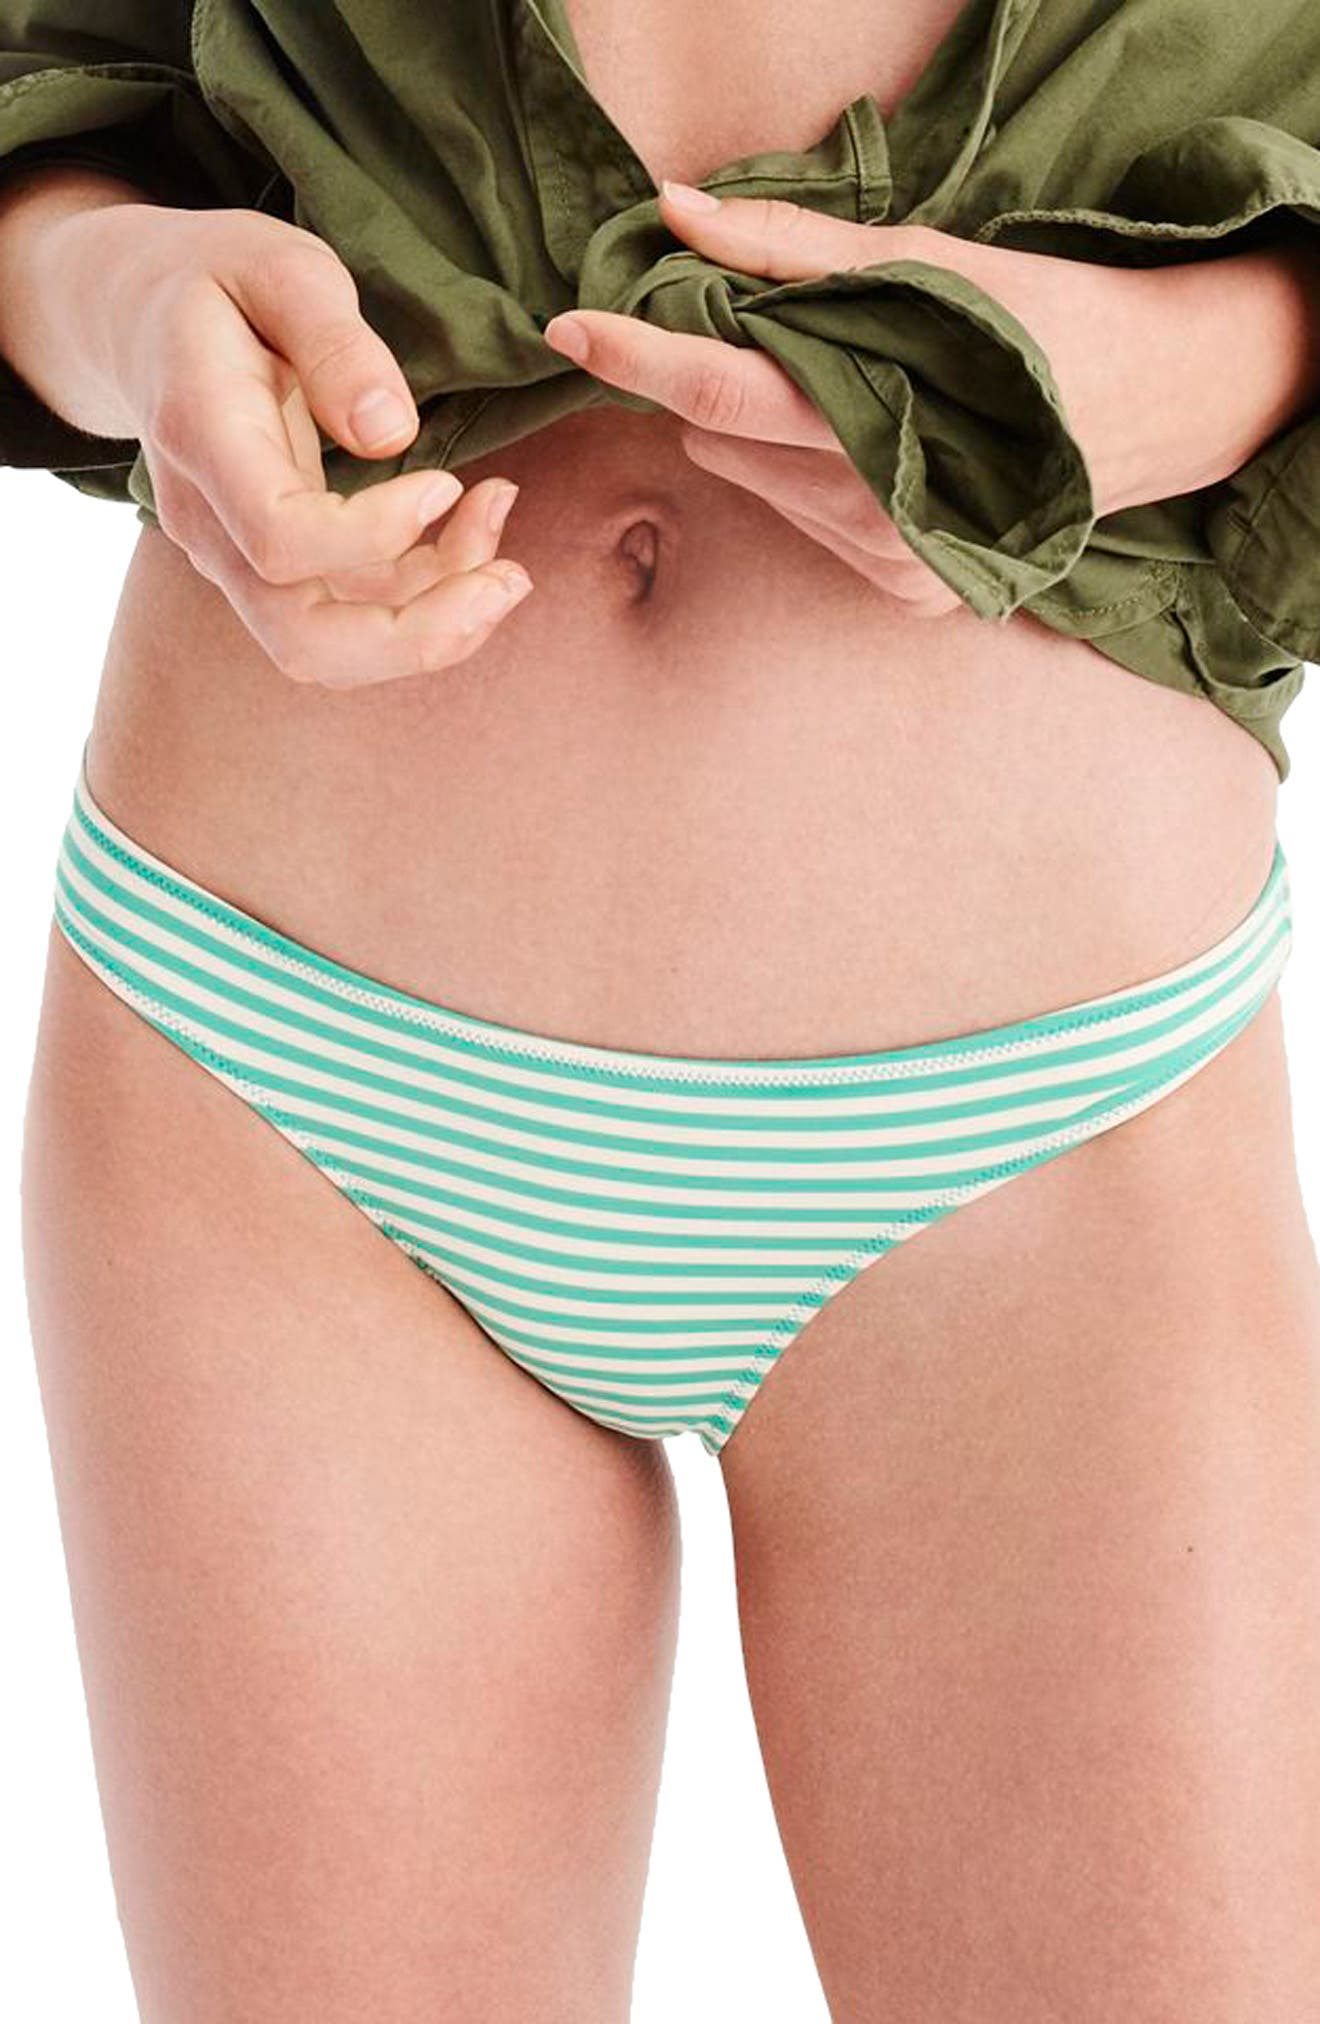 Daryl Hipster Cheeky Bikini Bottoms,                         Main,                         color, Bright Patina/ Ivory